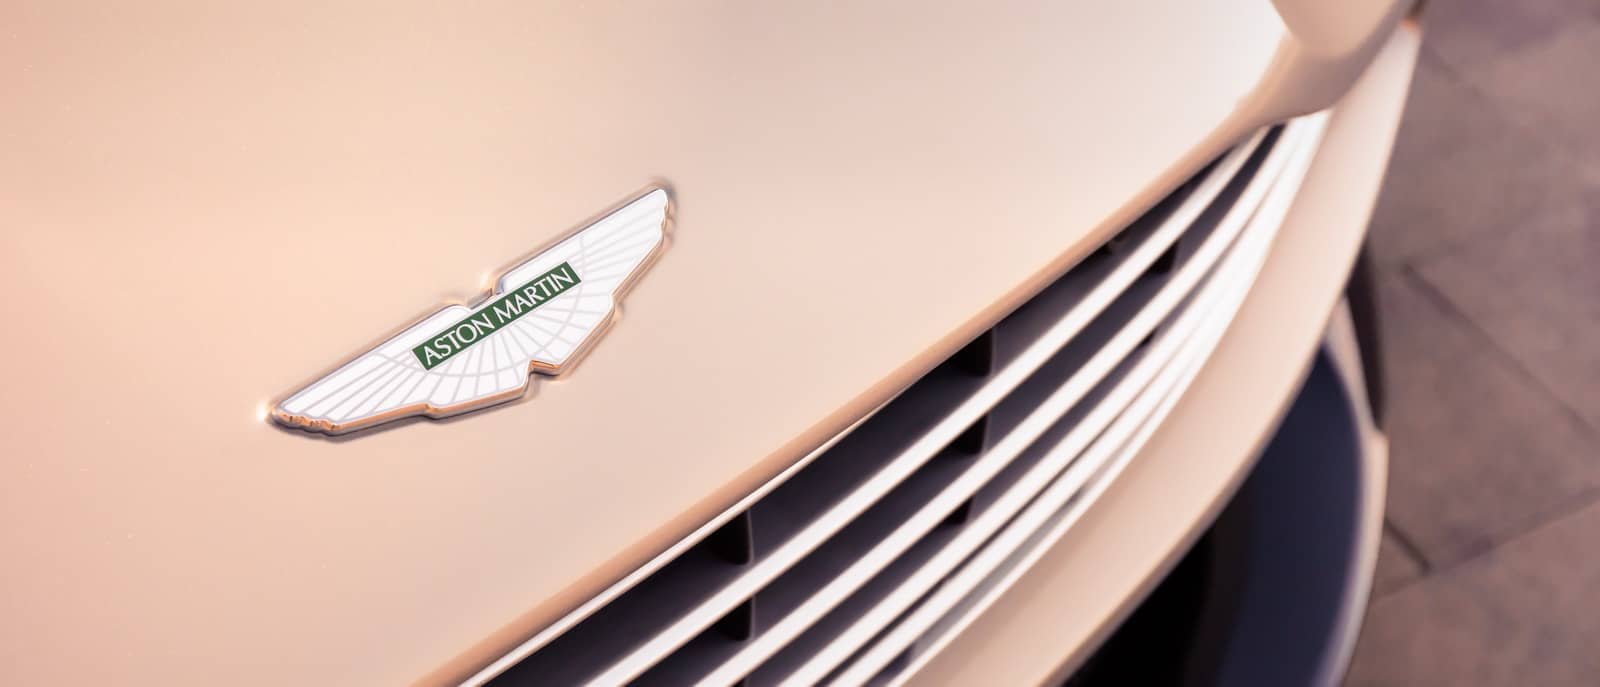 Aston Martin DB11 Volante 21